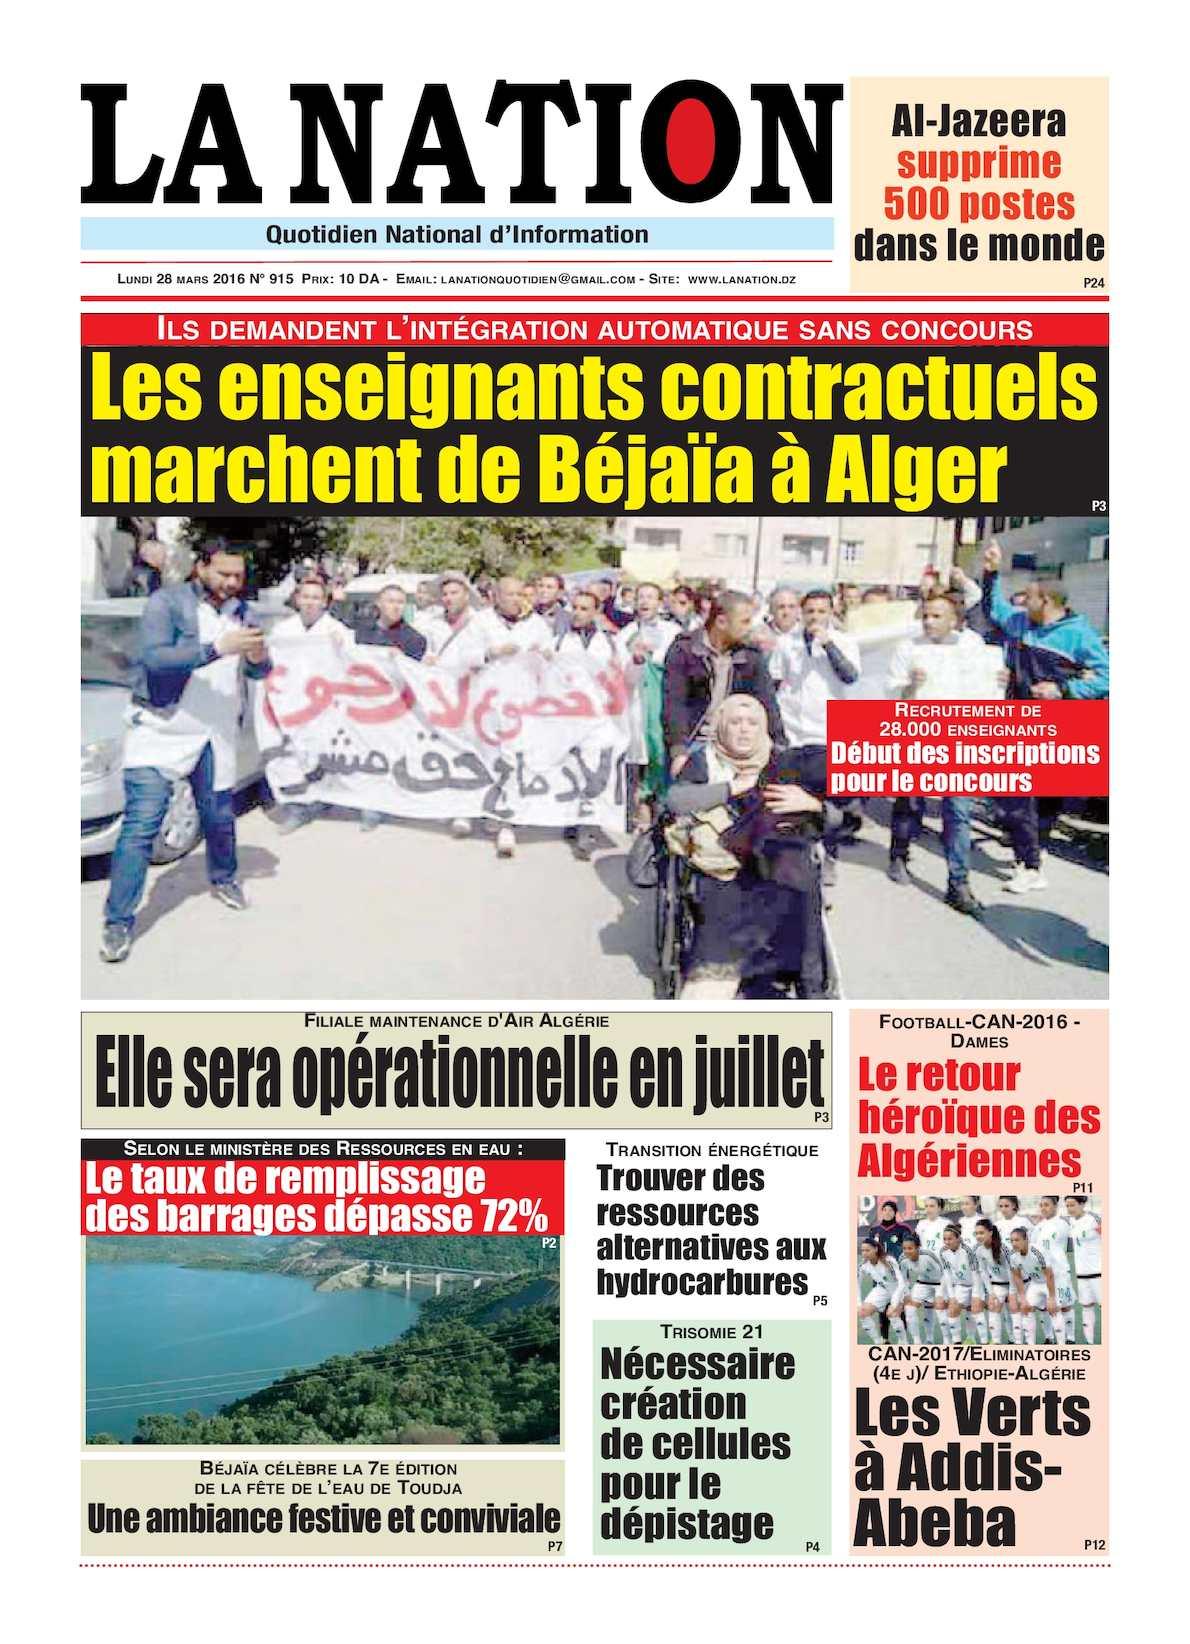 La Nation Edition N 915